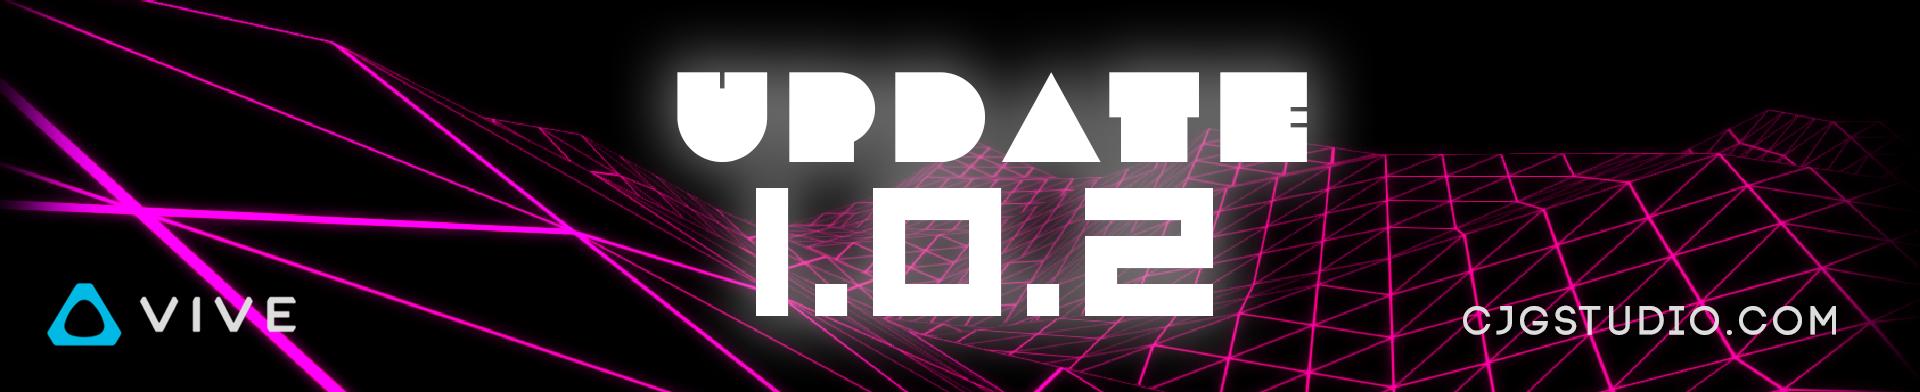 udpate header 1 0 2